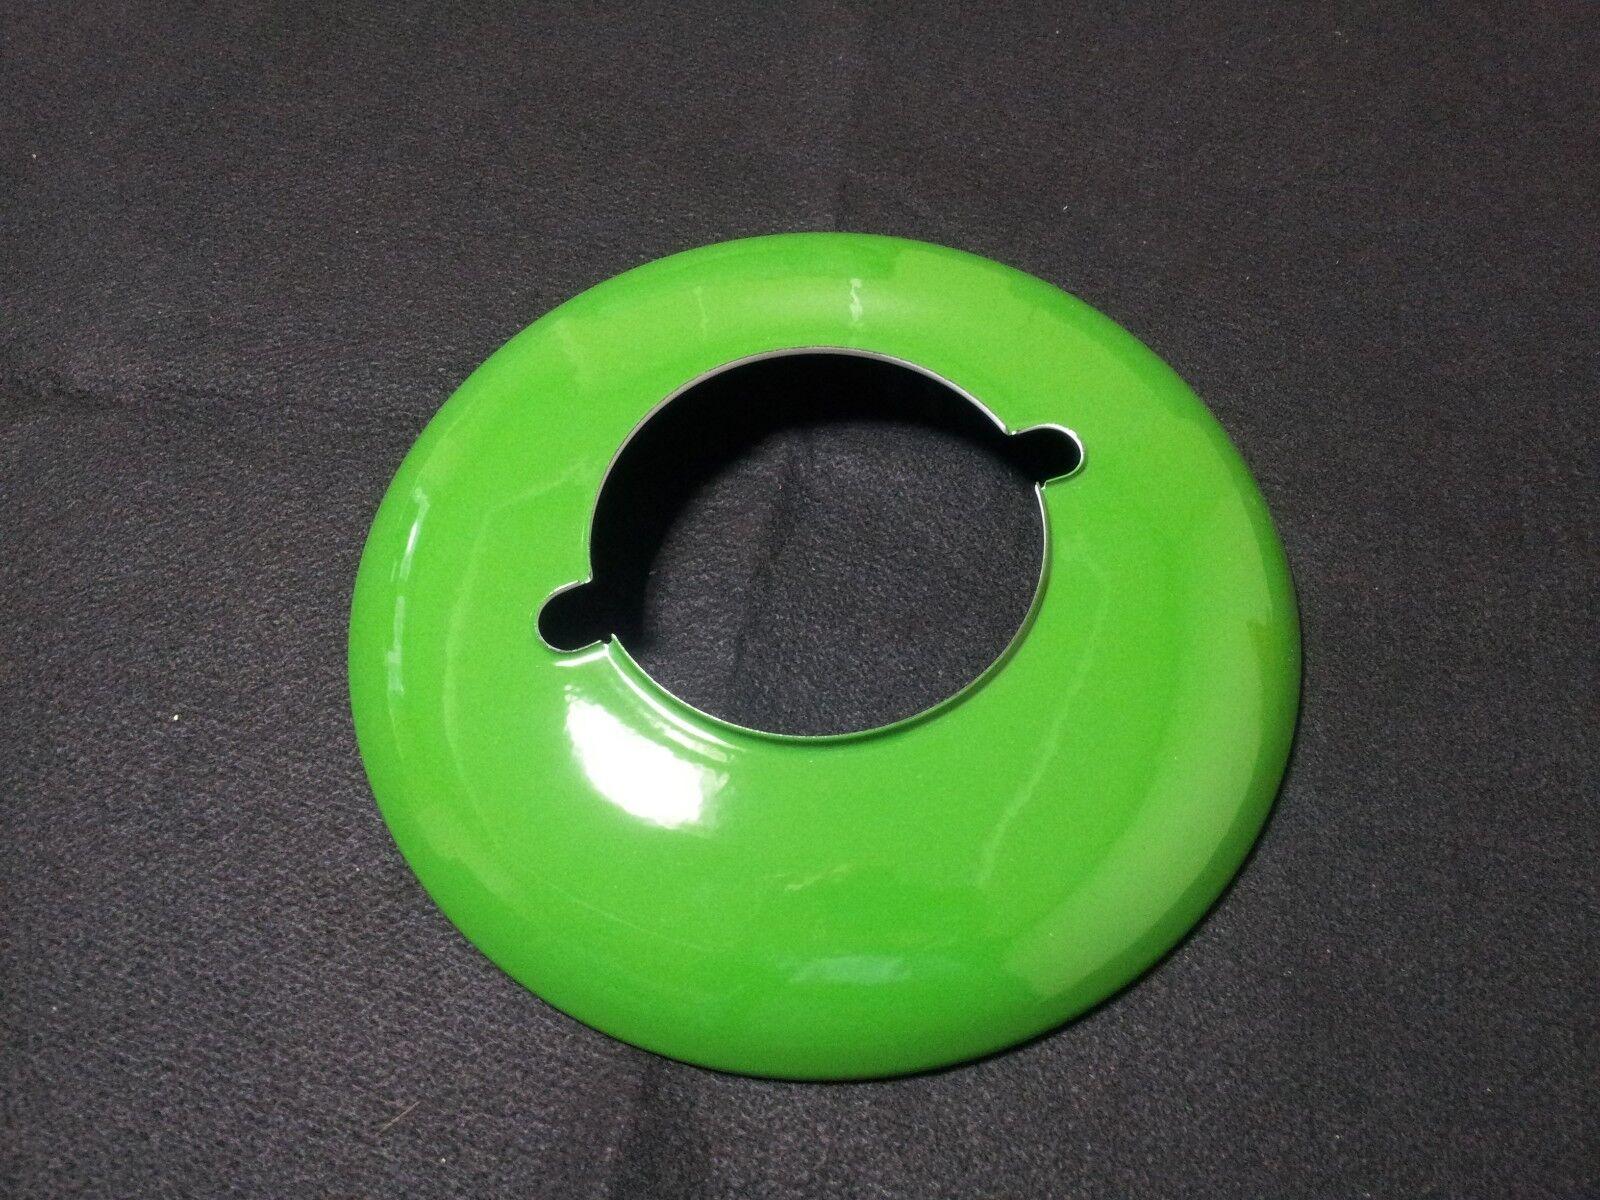 Reflector for for Reflector Vapalux 320/M320/300/310/315/M1/M1B/M320,Bialaddin 300X Lamp Grün 795f9a